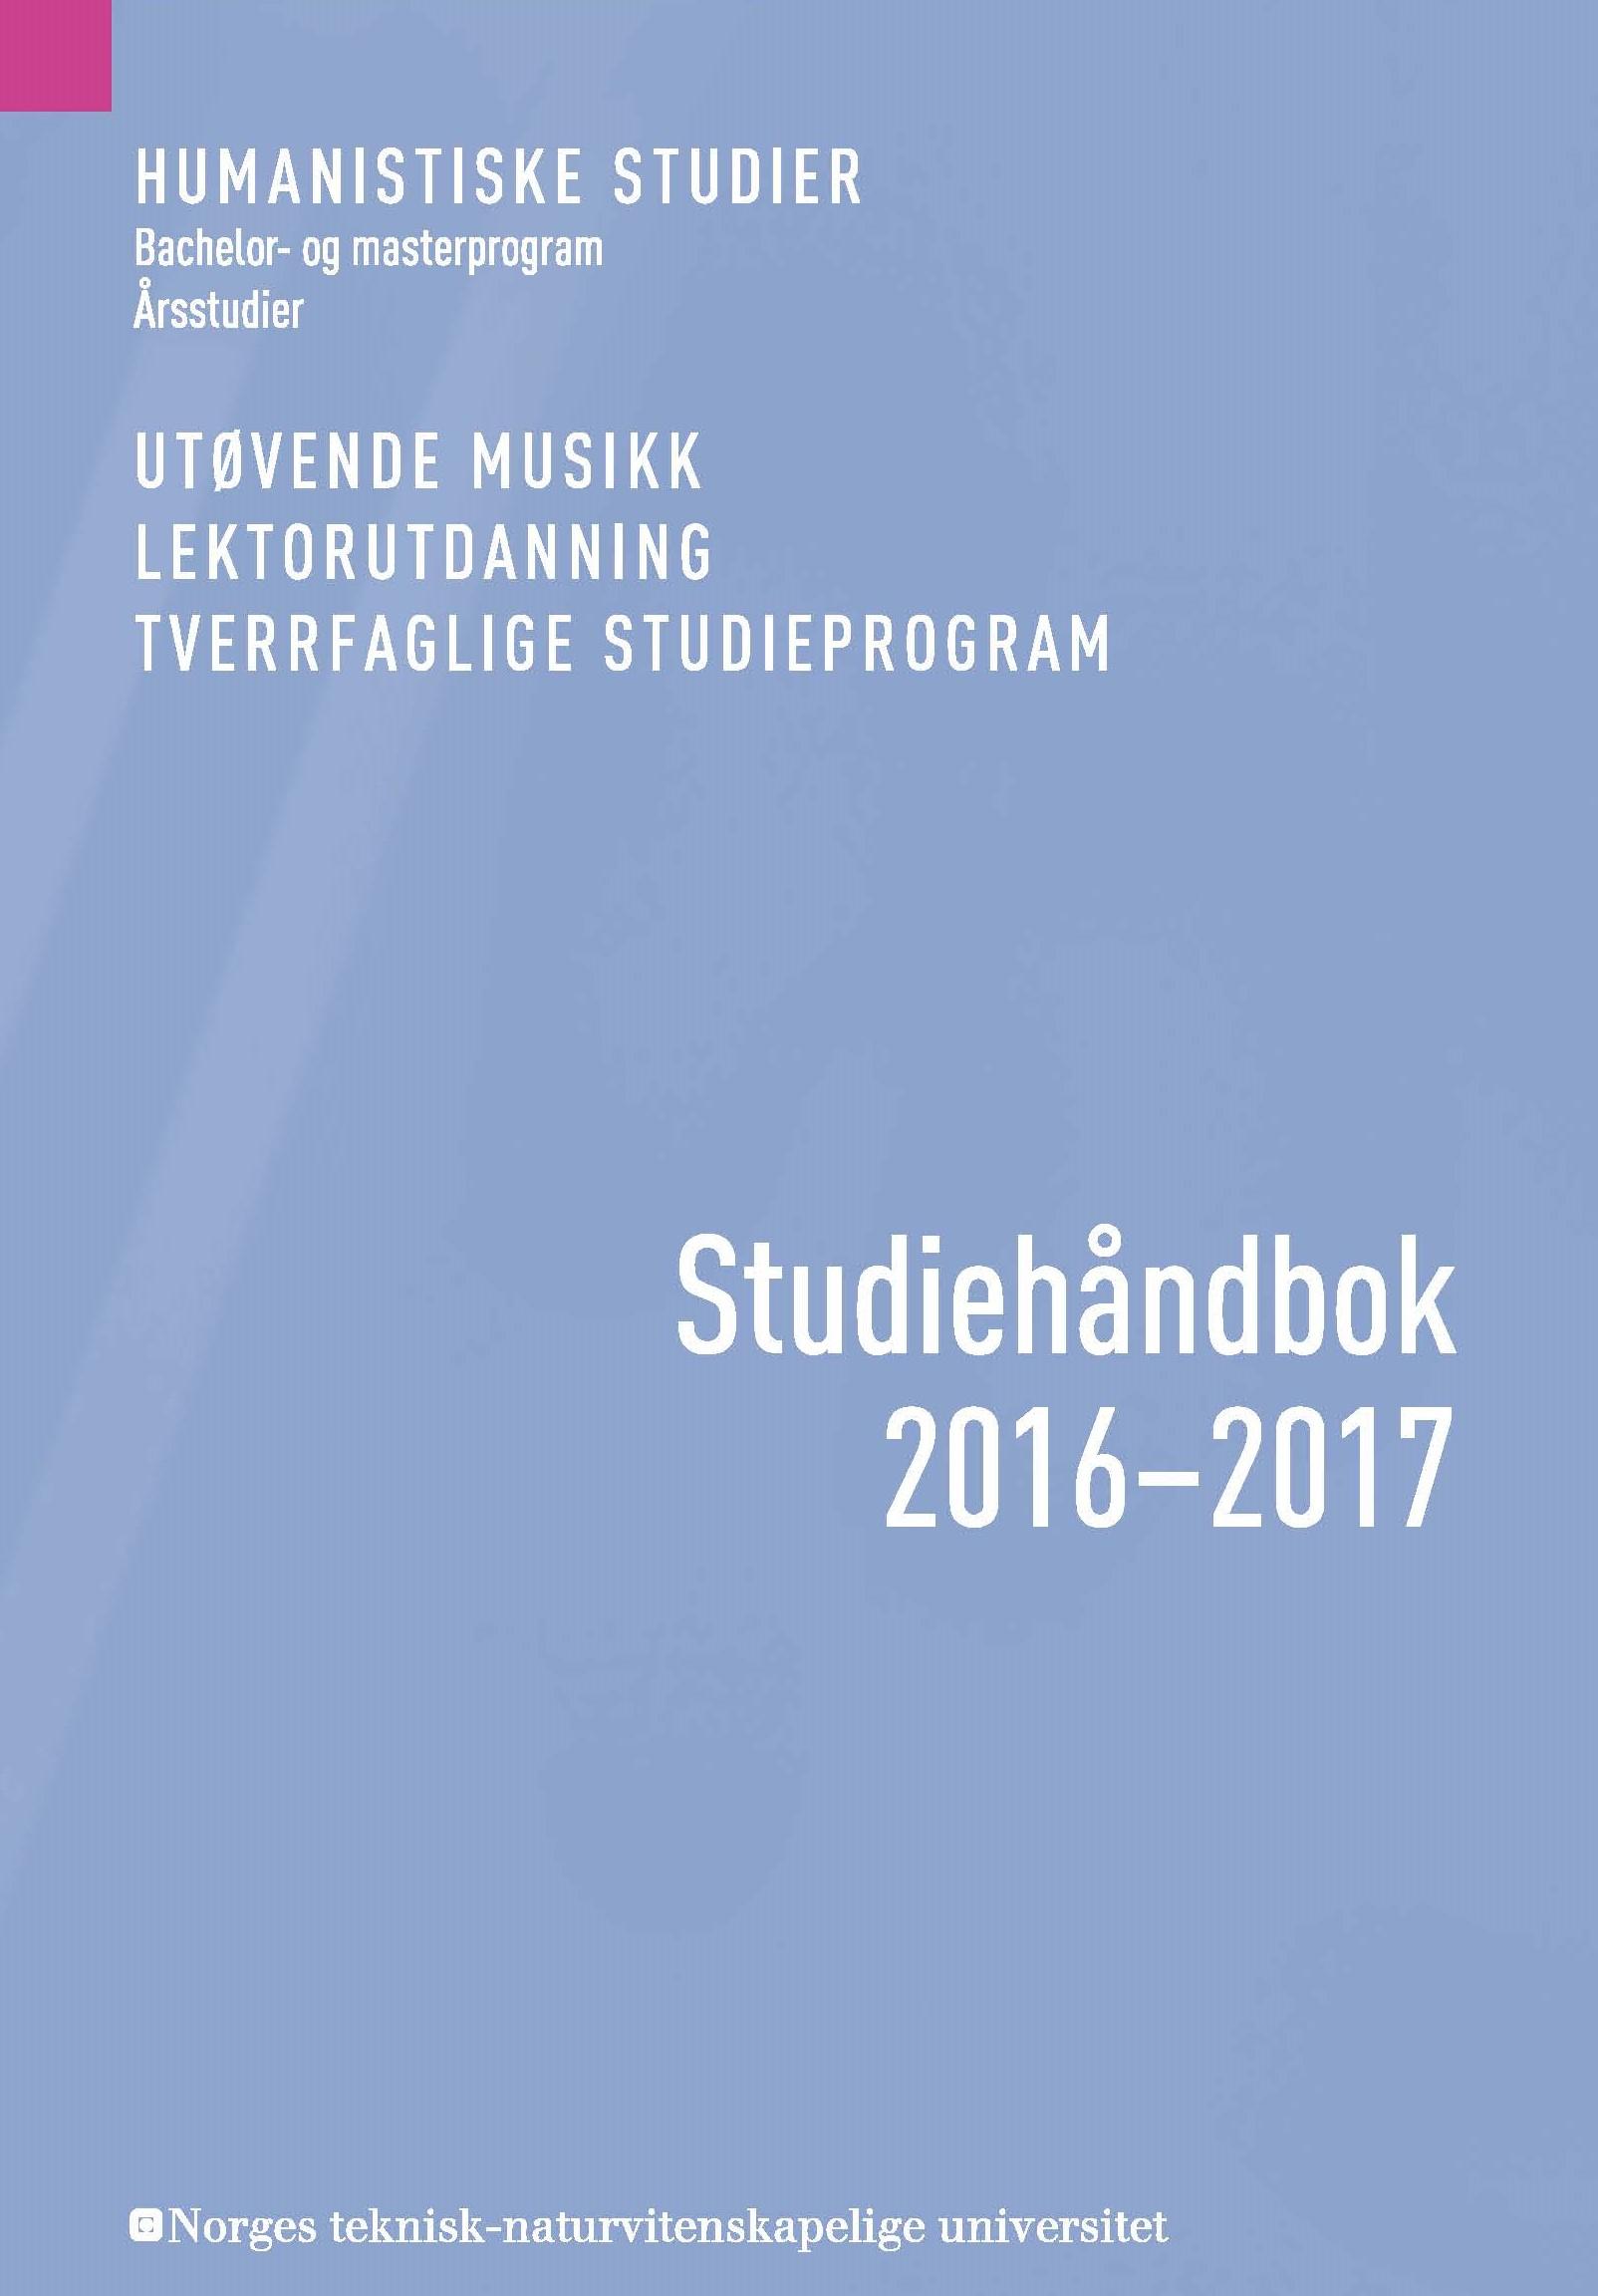 Studiehåndbok HF